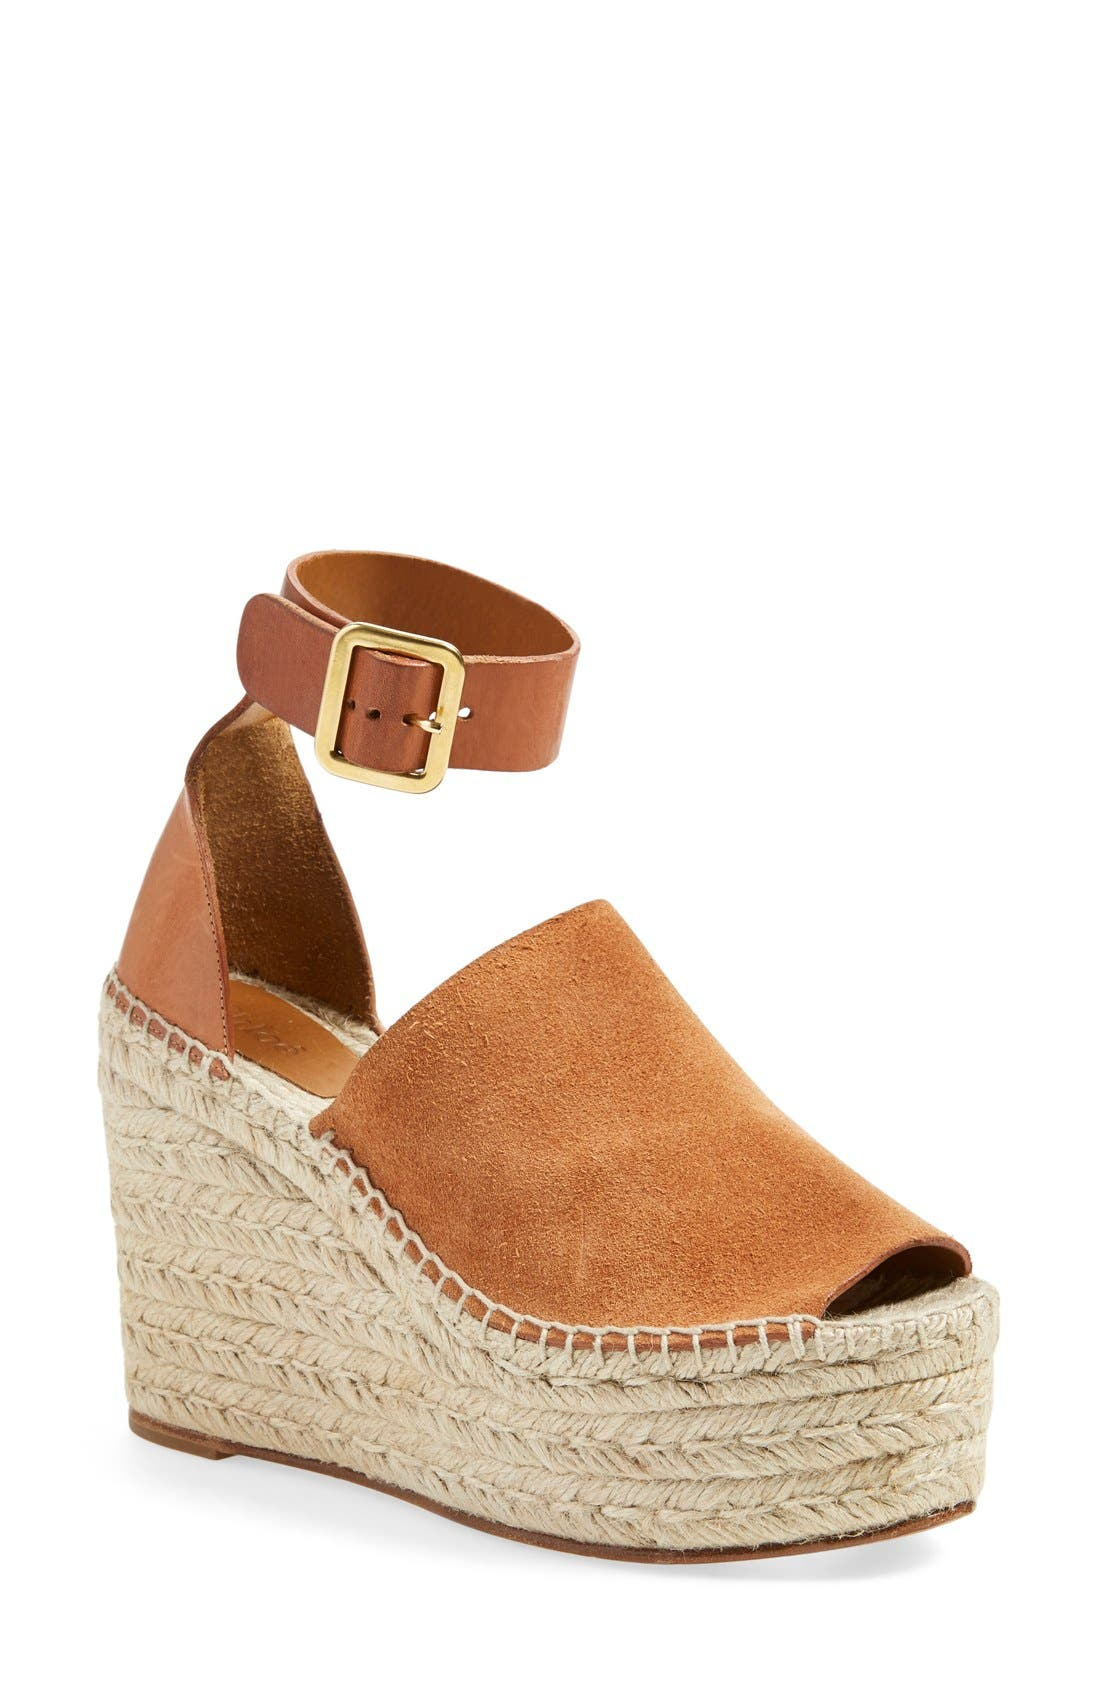 Alternate Image 1 Selected - Chloé 'Isa' Espadrille Wedge Sandal (Women)